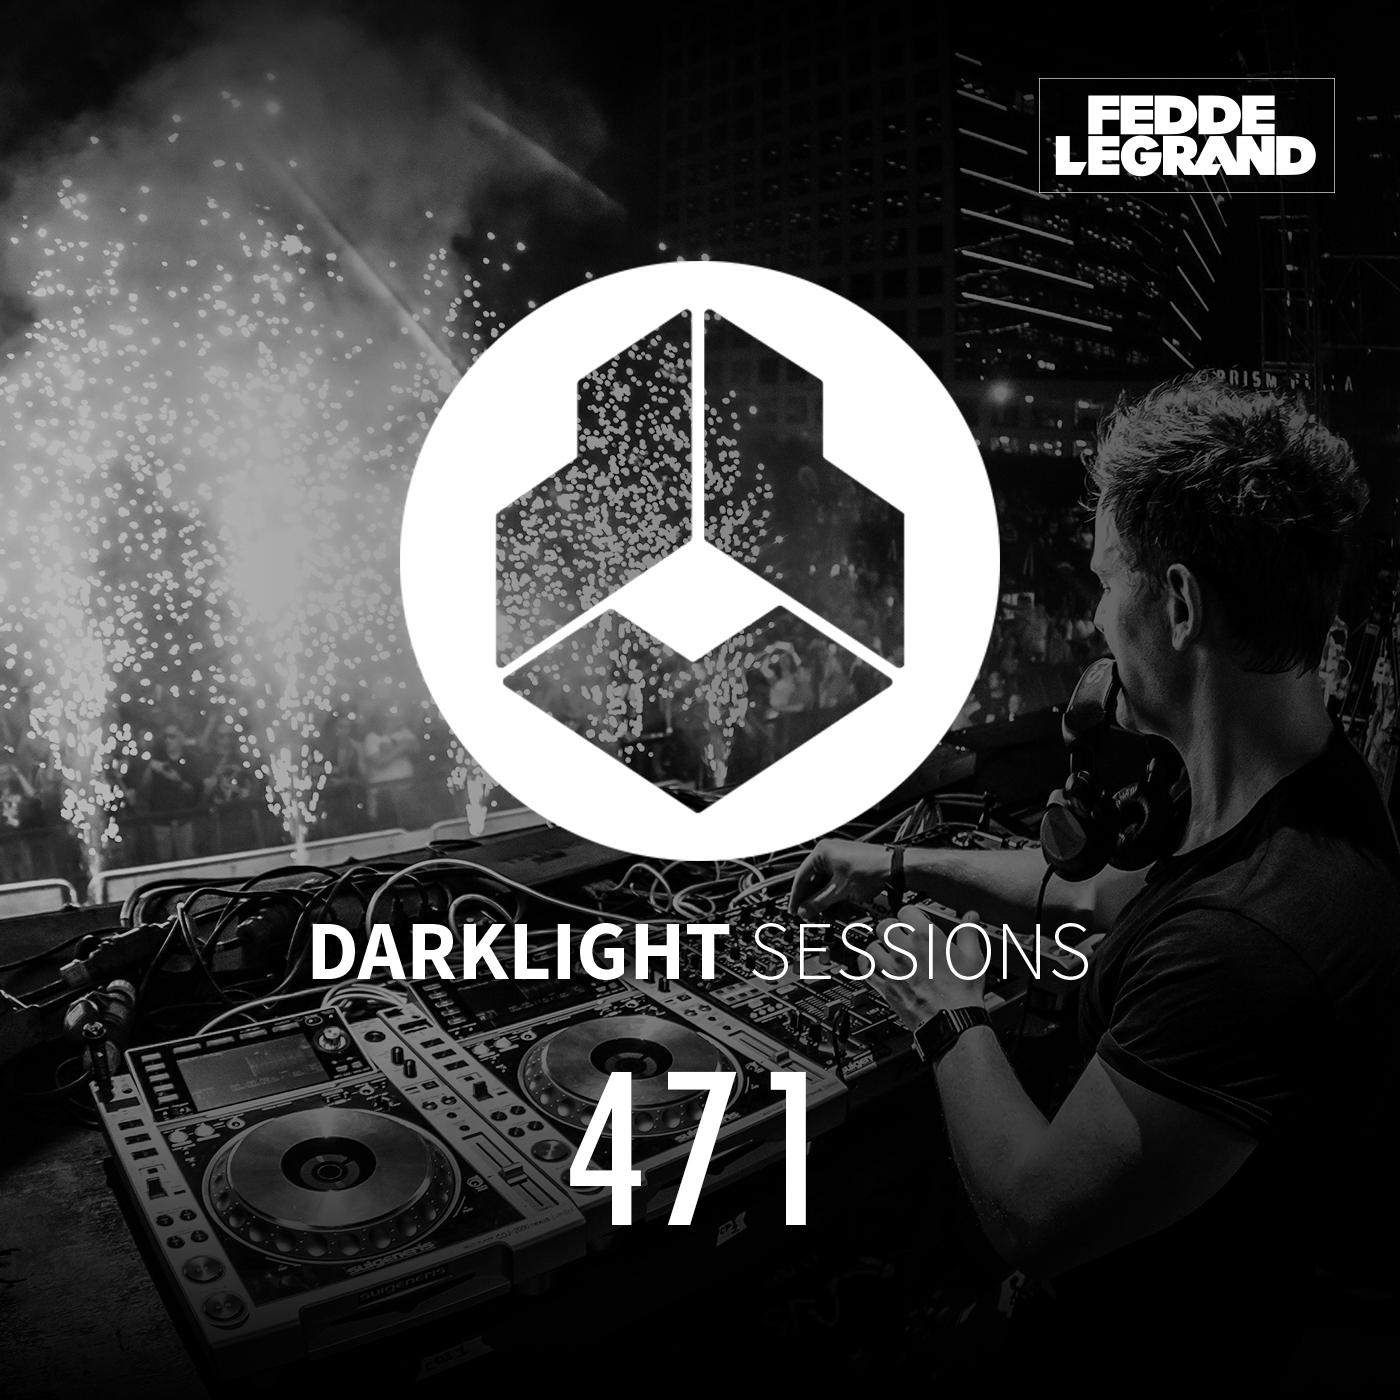 Darklight Sessions 471